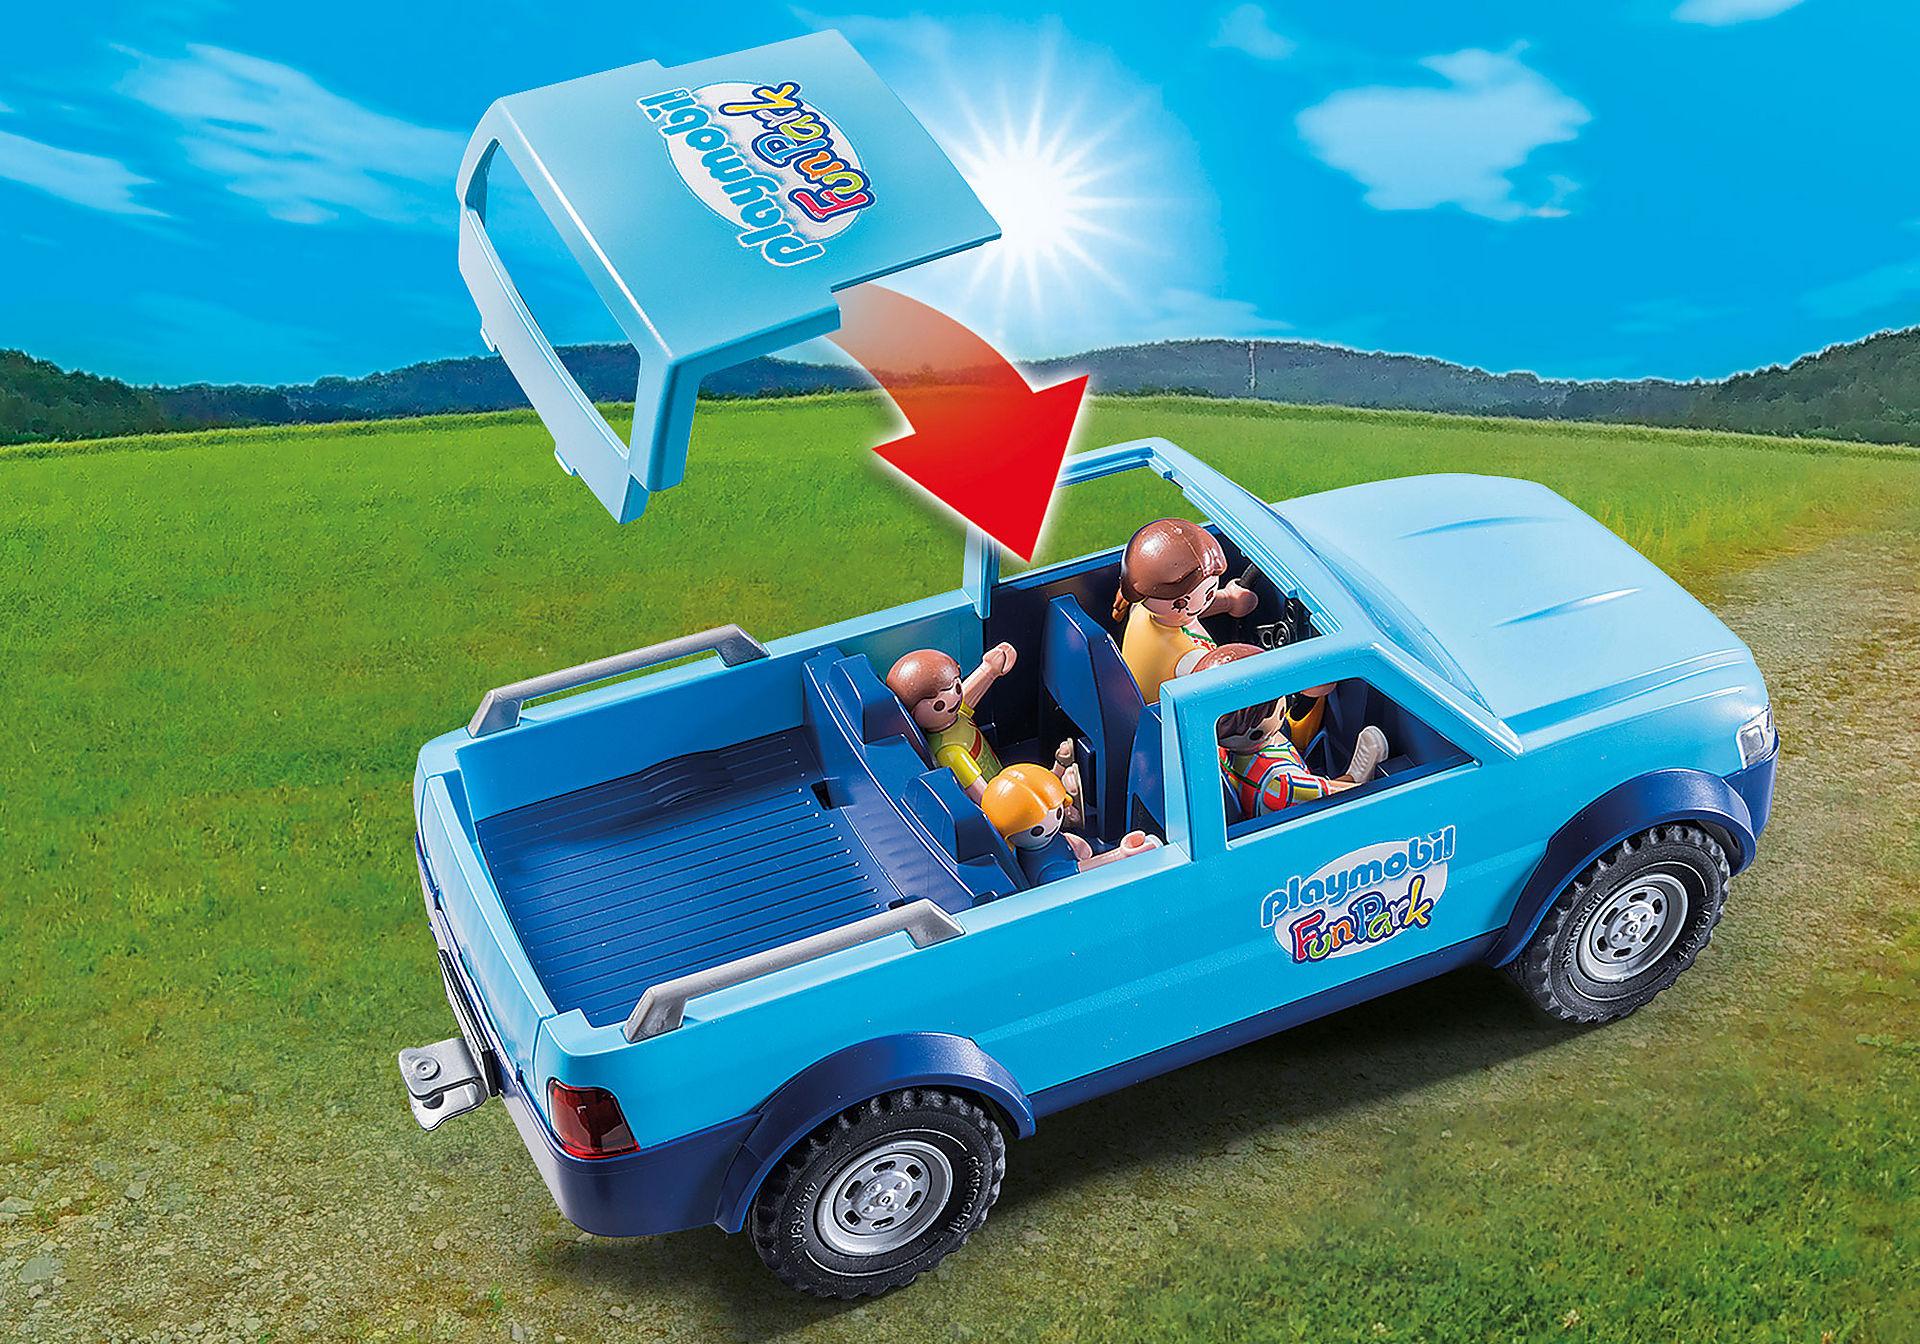 9502 Playmobil-Pick-Up mit Wohnwagen zoom image4